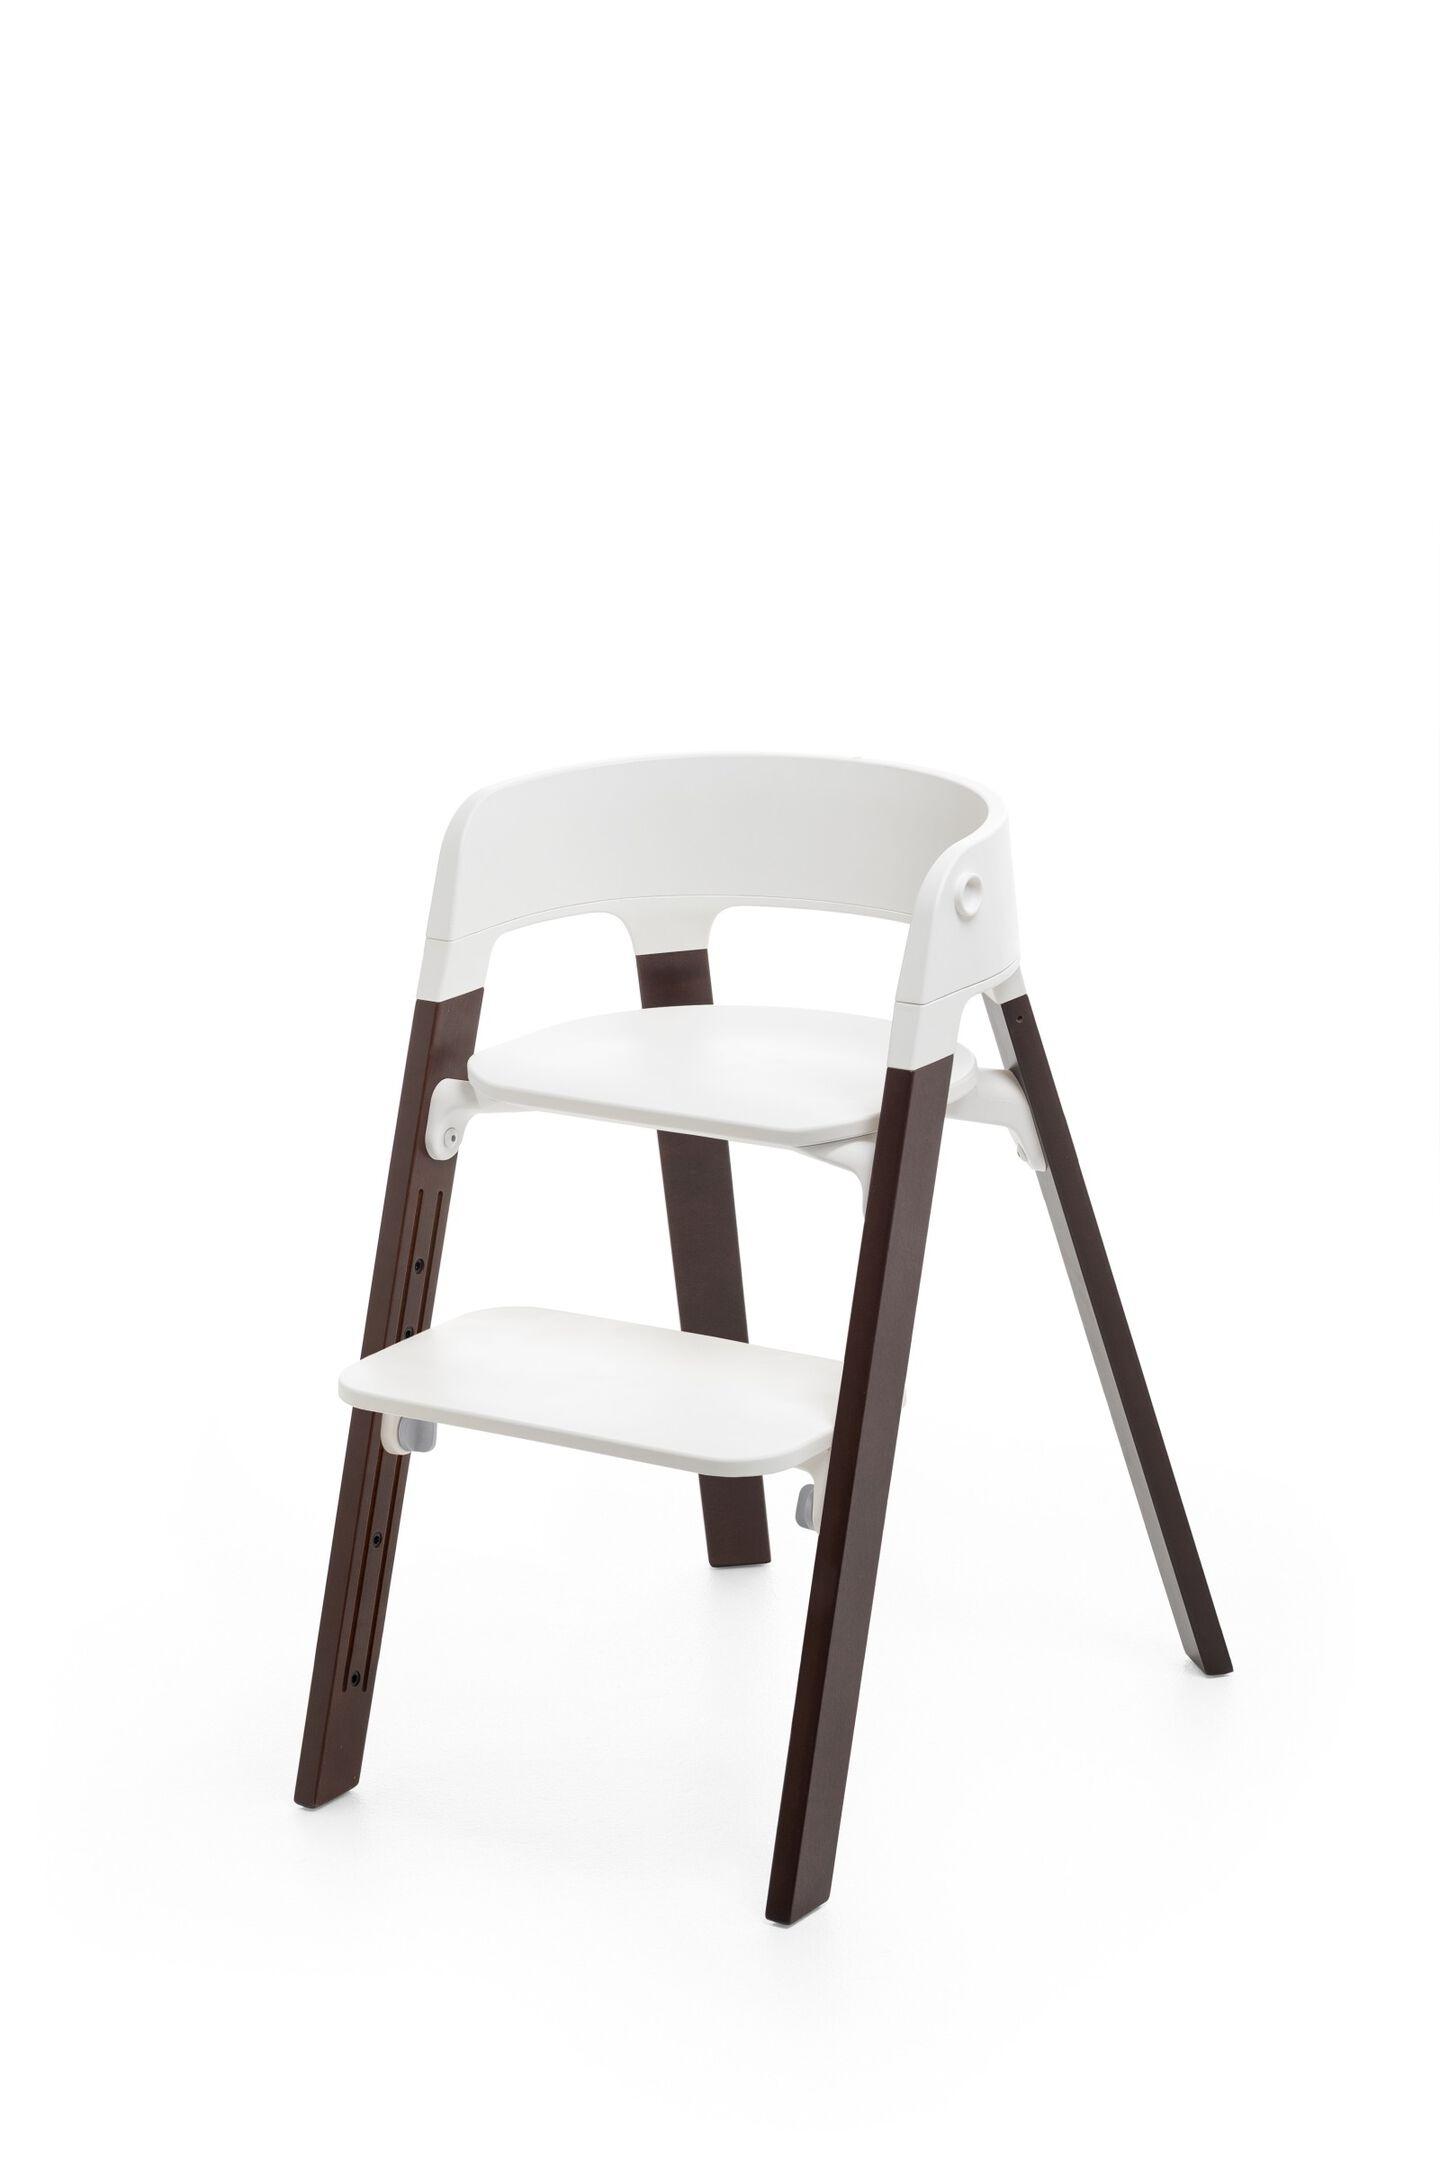 Stokke Steps Chair Walnut Brown